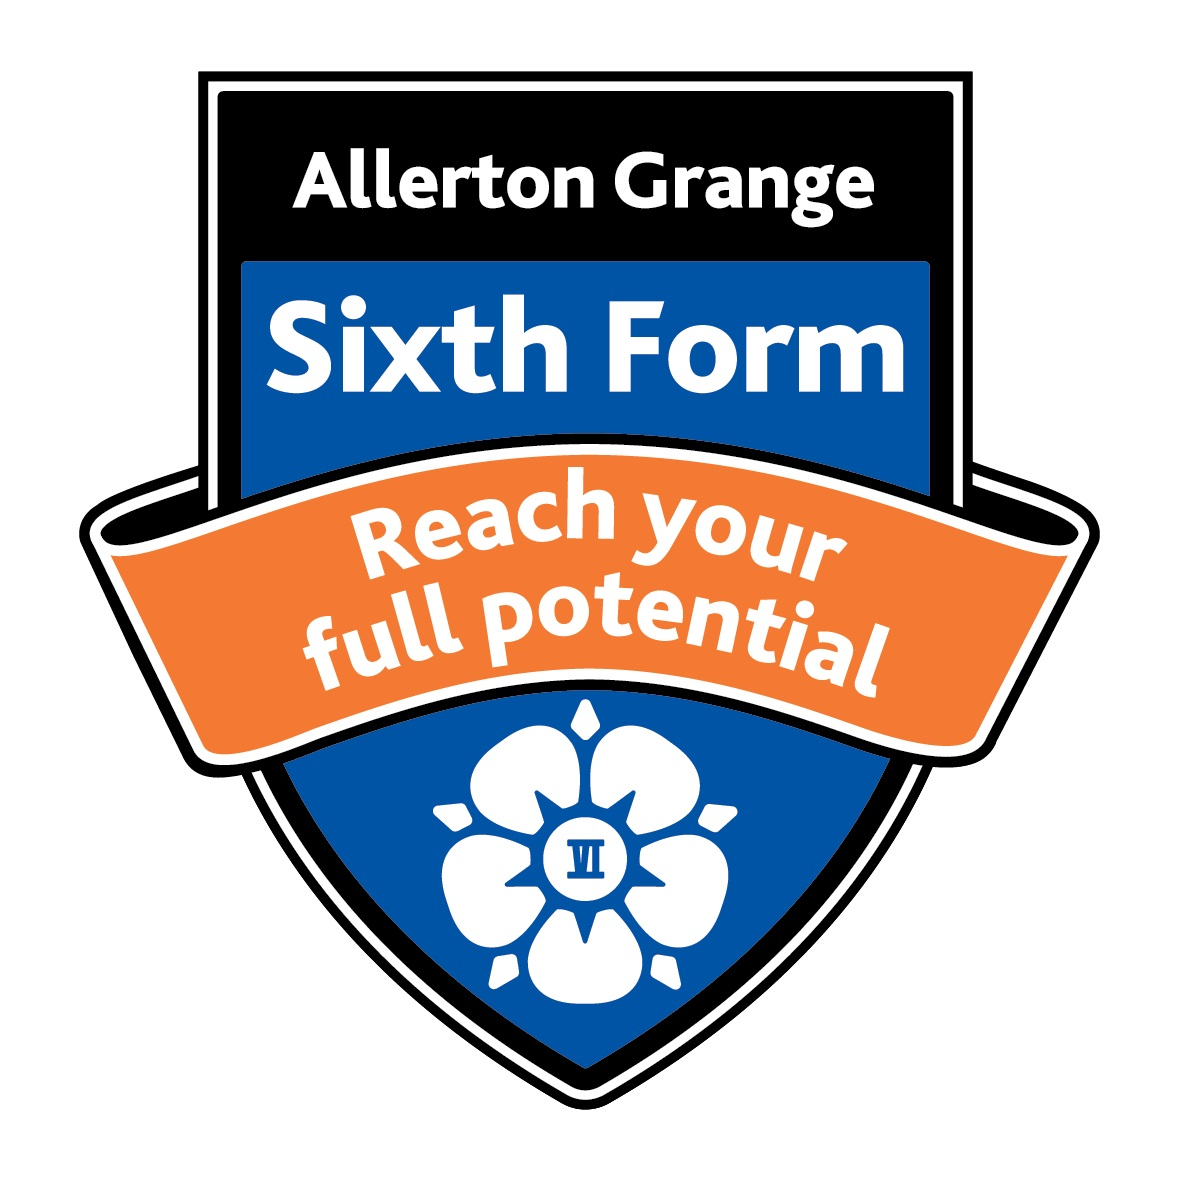 Allerton Grange School